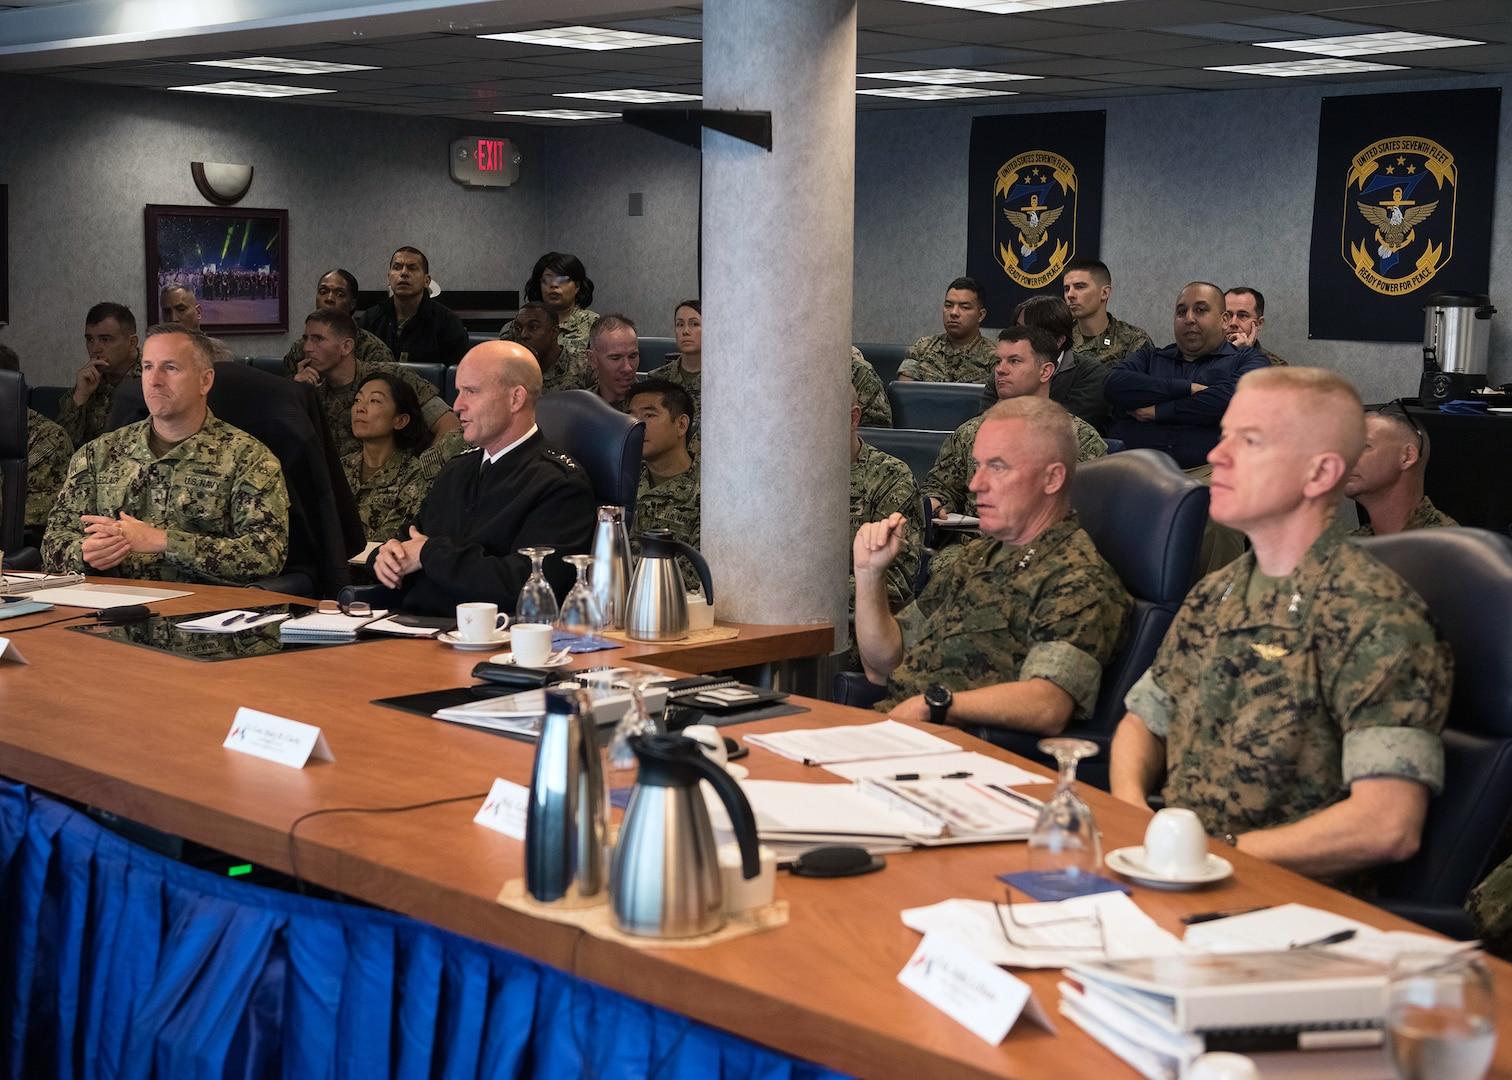 III MEF and 7th Fleet Join for Staff Talks in Yokosuka